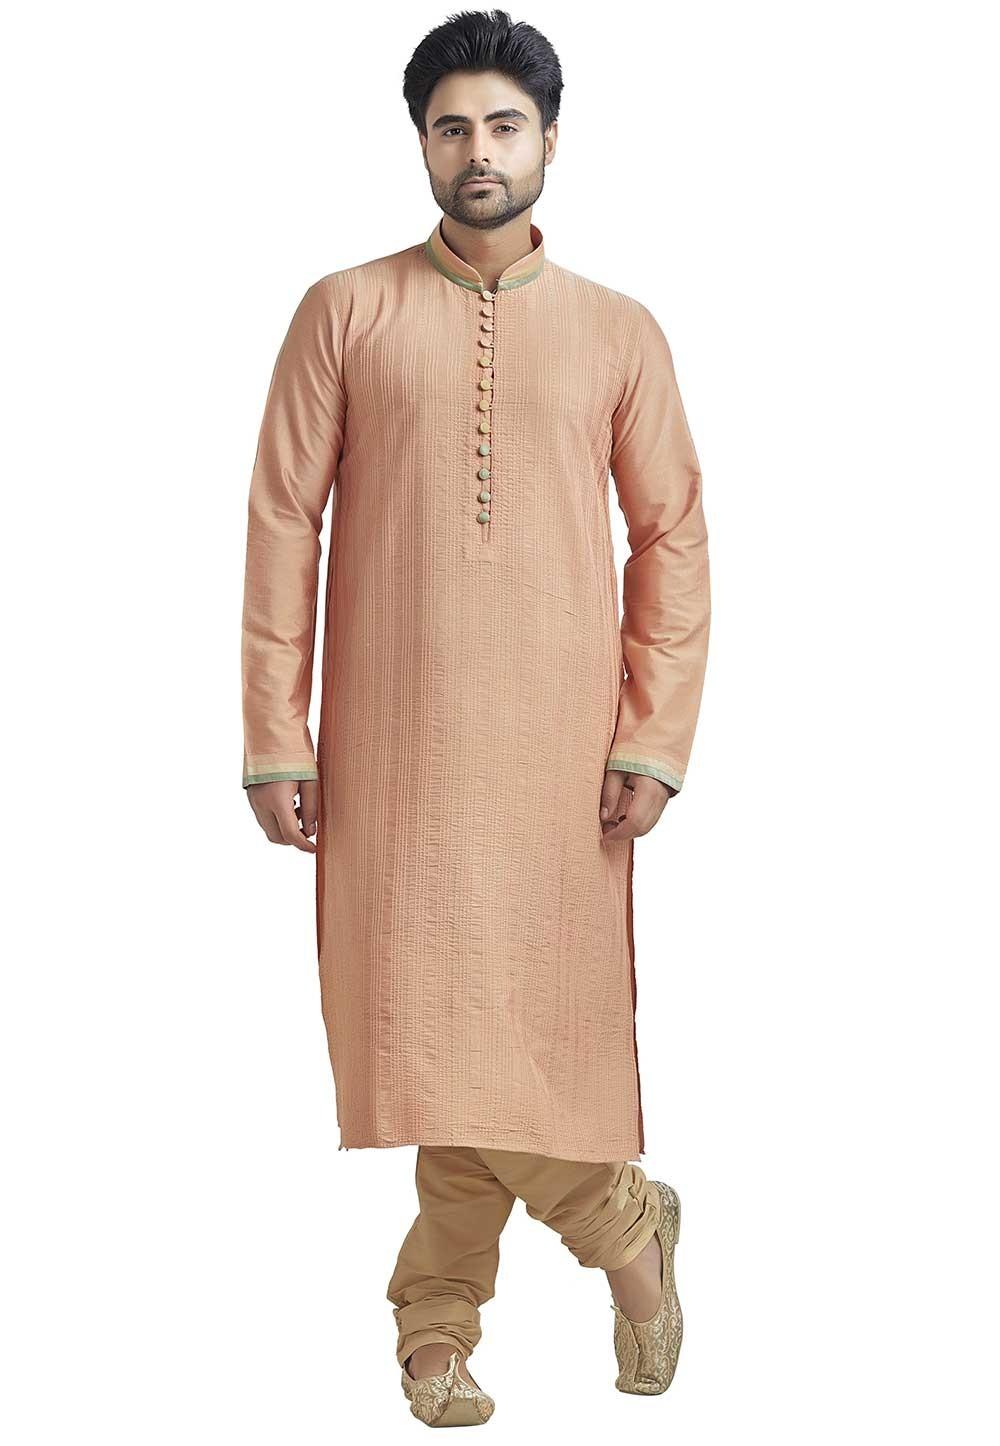 Peach Colour Readymade Indian Kurta Pajama for Mens